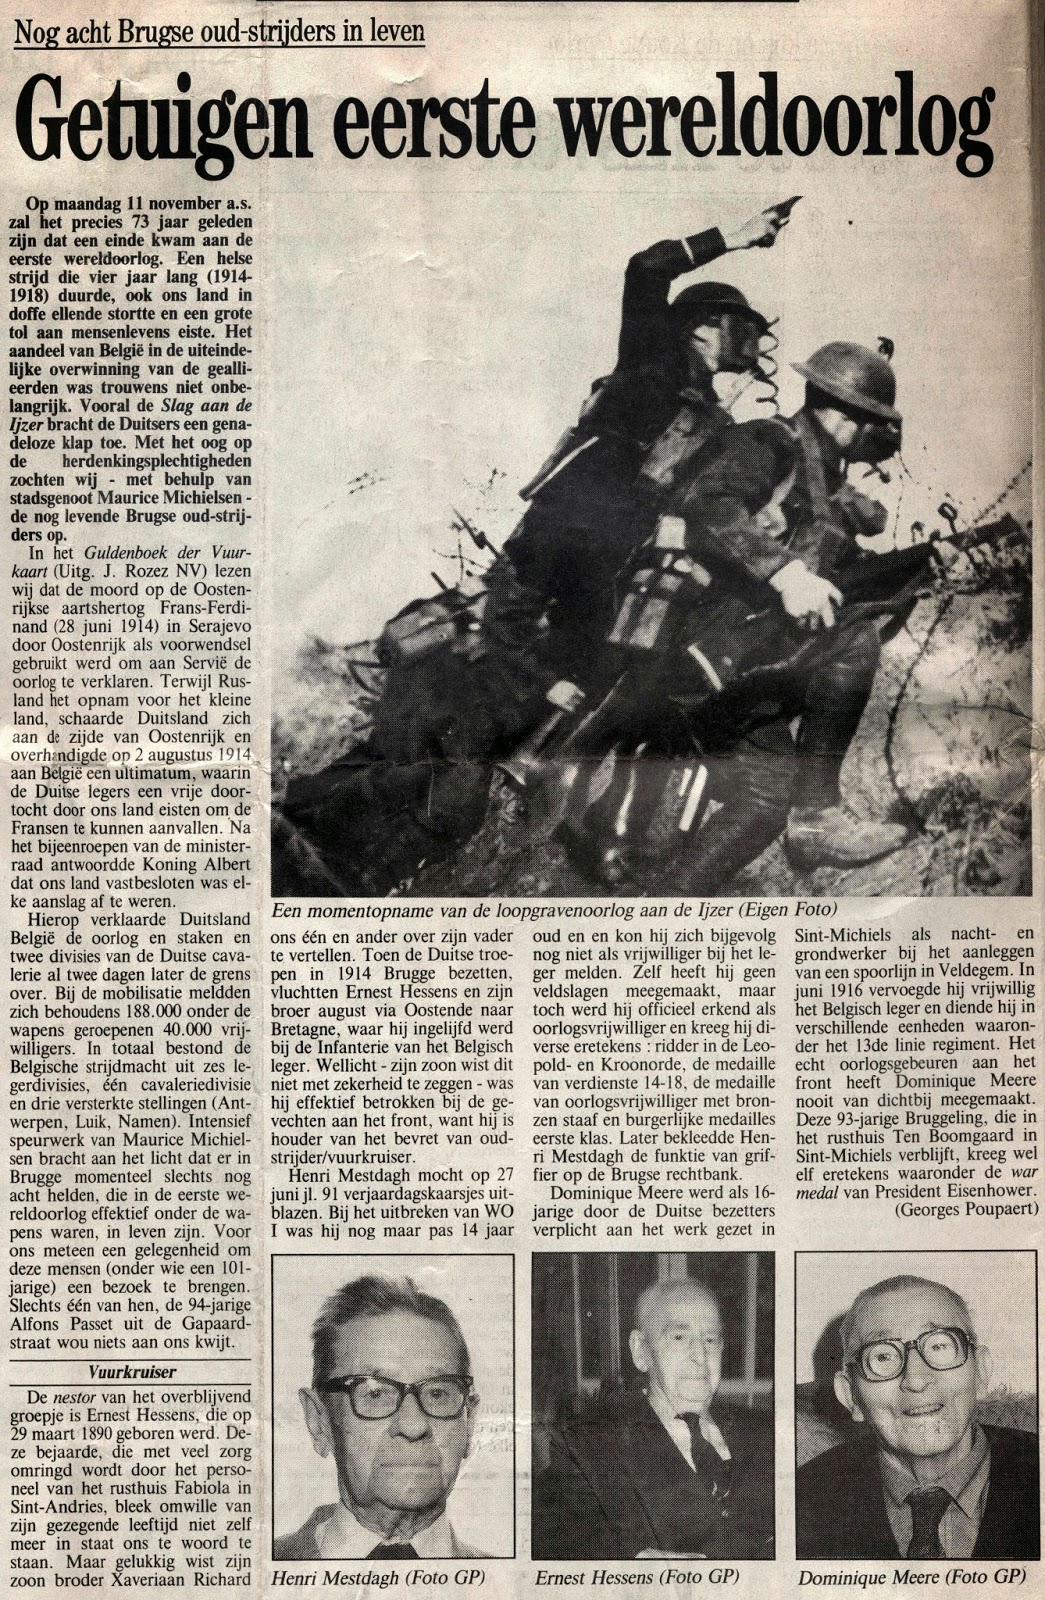 Brugse oud-strijders getuigen. Krant van West-Vlaanderen van 8 november 1991.